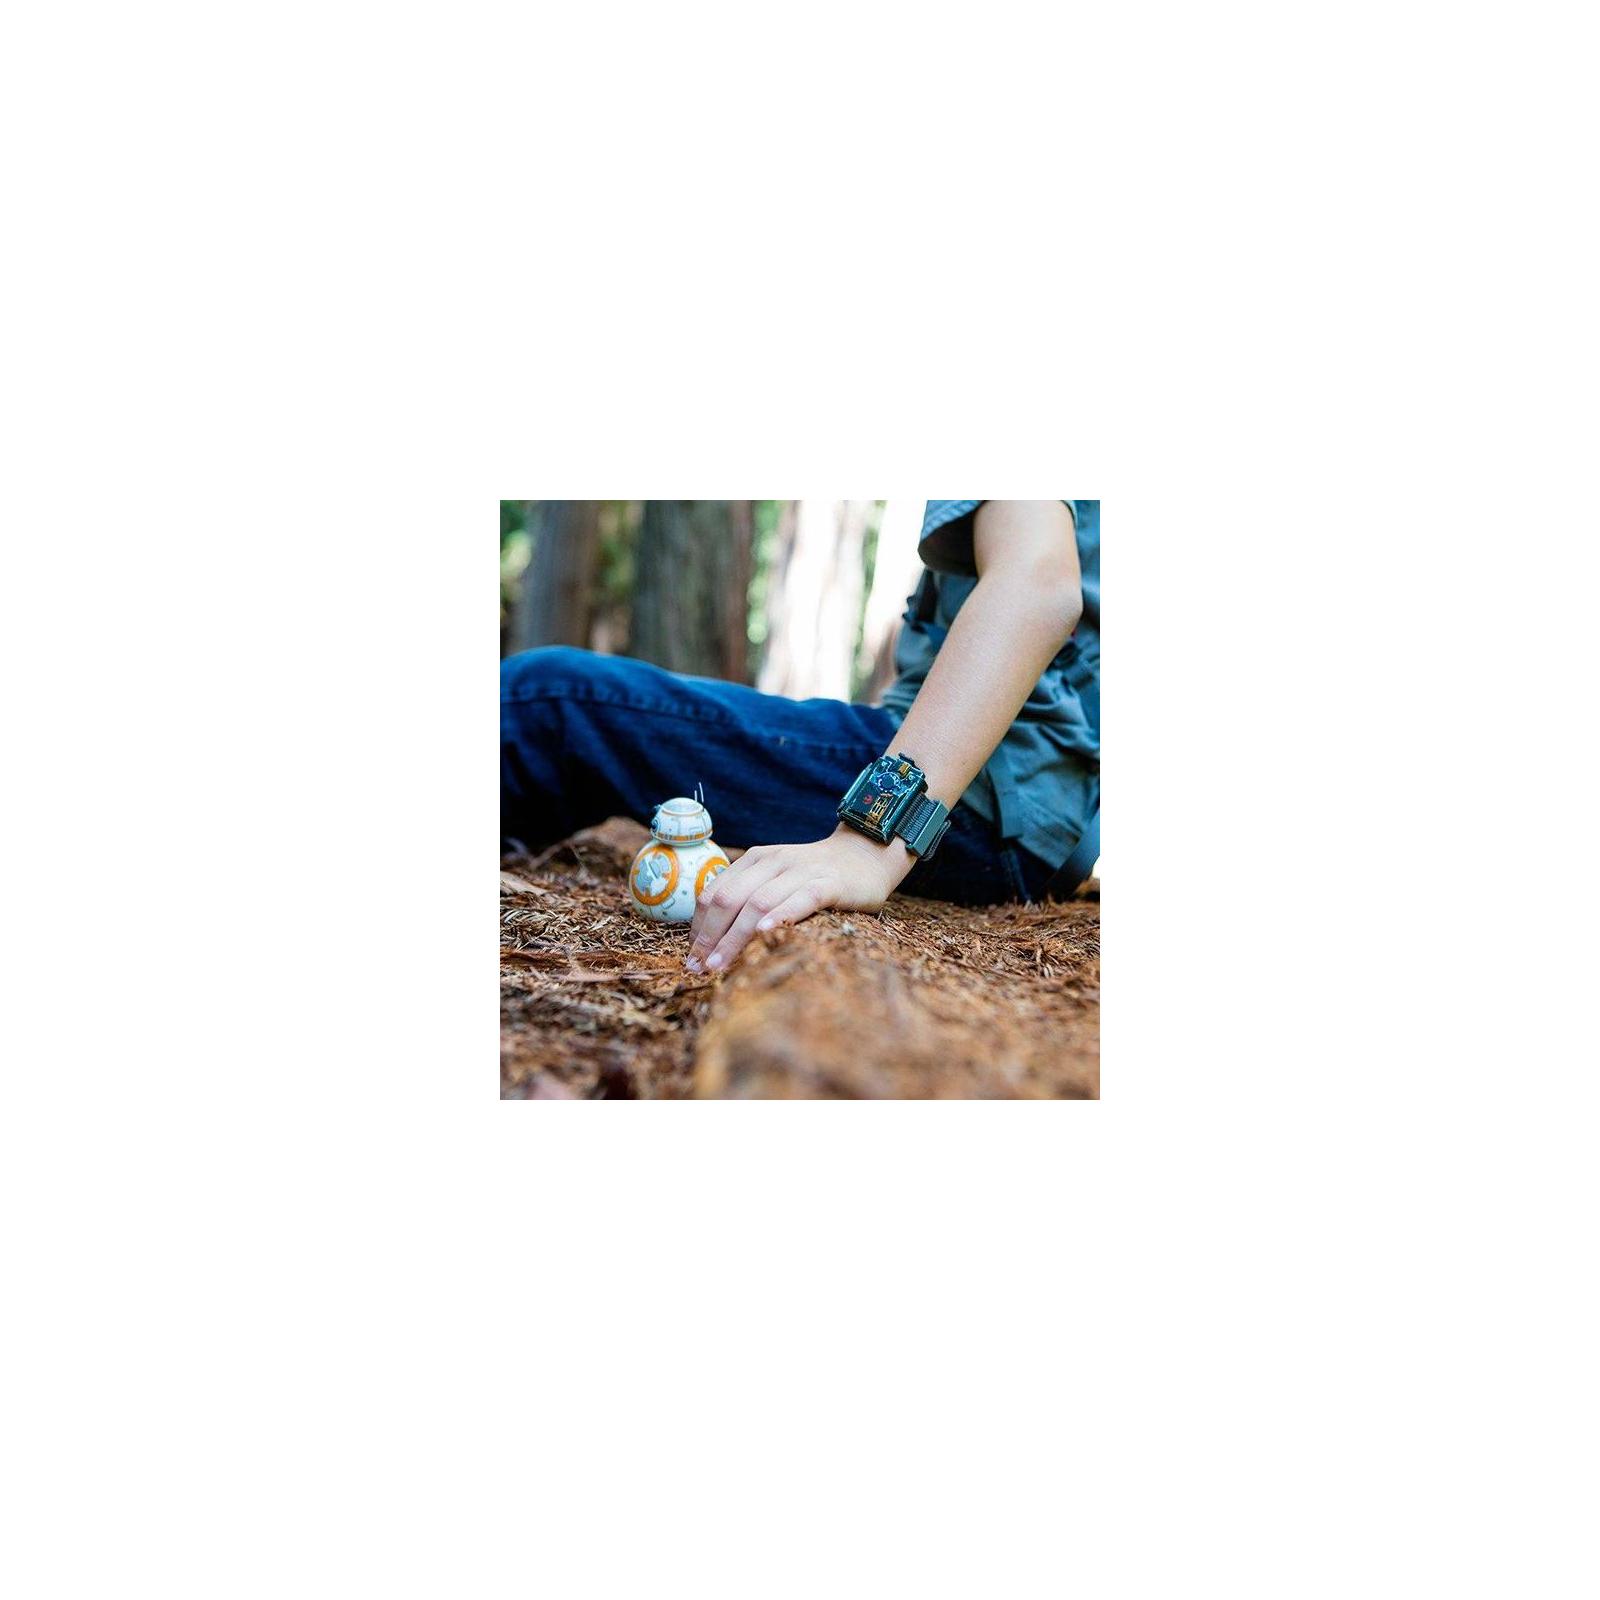 Робот Sphero BB-8 Special Edition with Force Band (322384) изображение 11